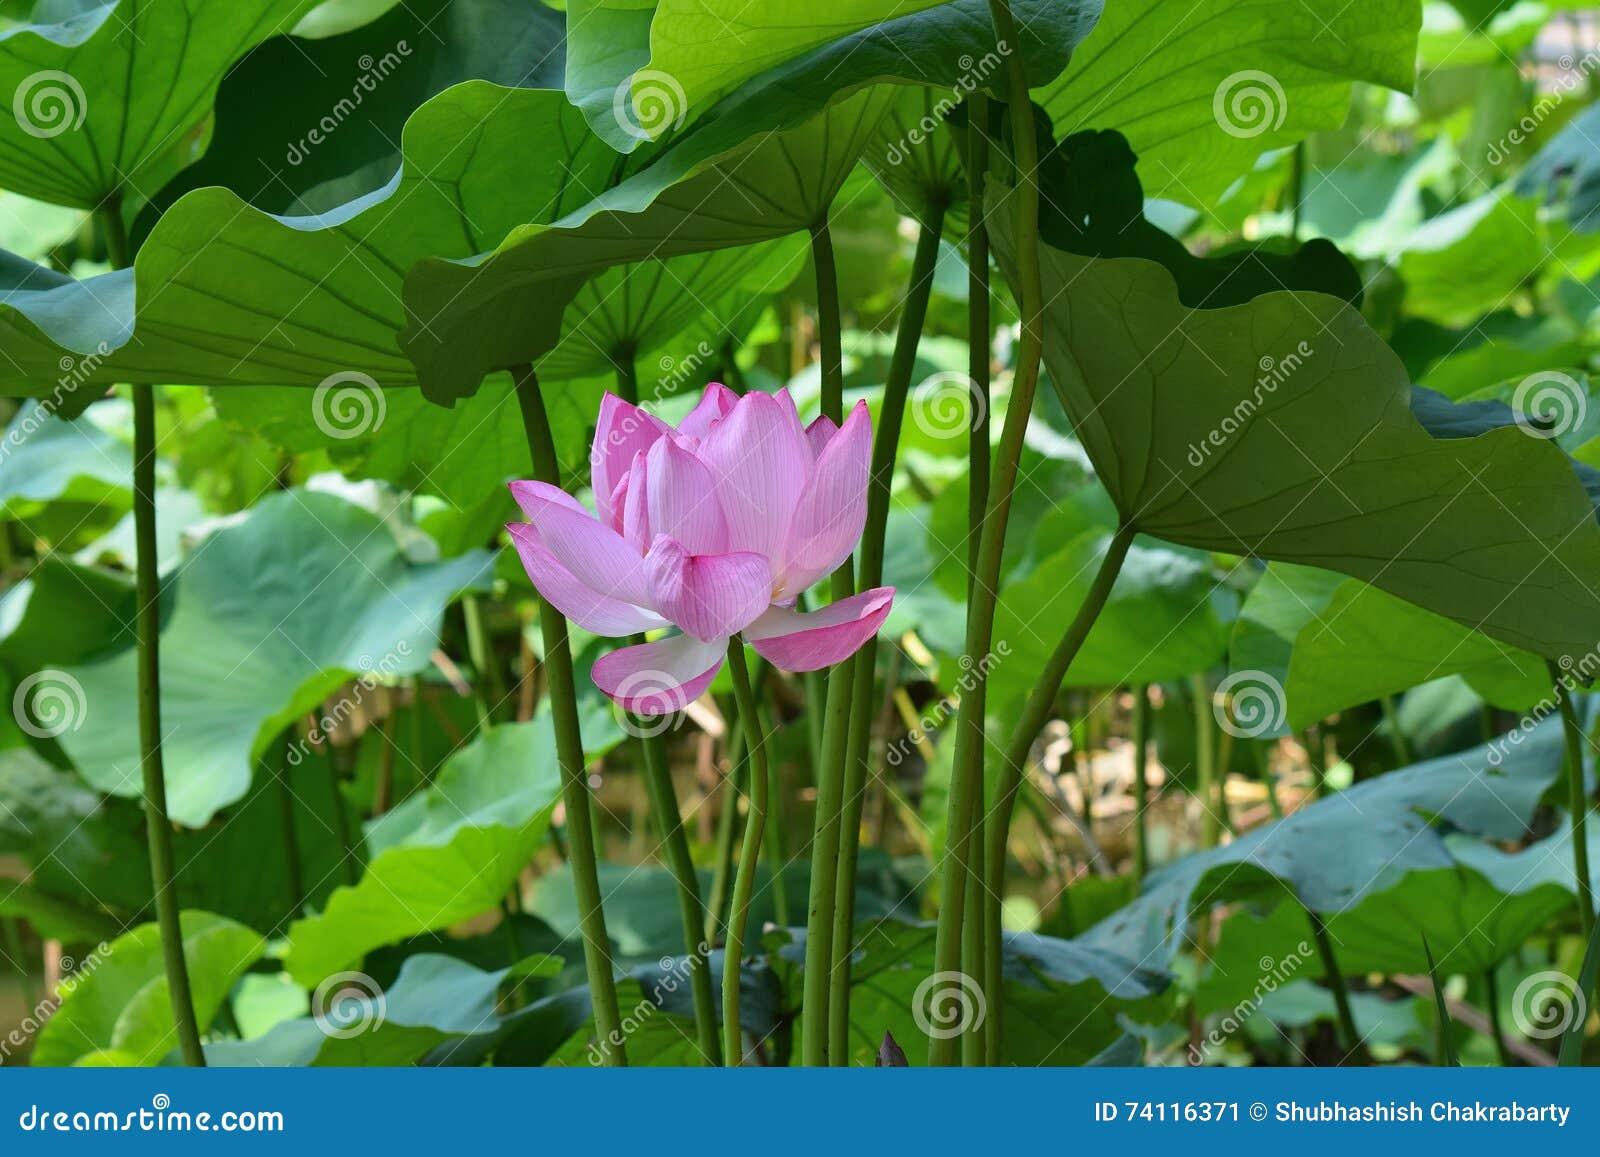 Lotus flower symbol of buddhism and religion stock image image of lotus flower symbol of buddhism and religion mightylinksfo